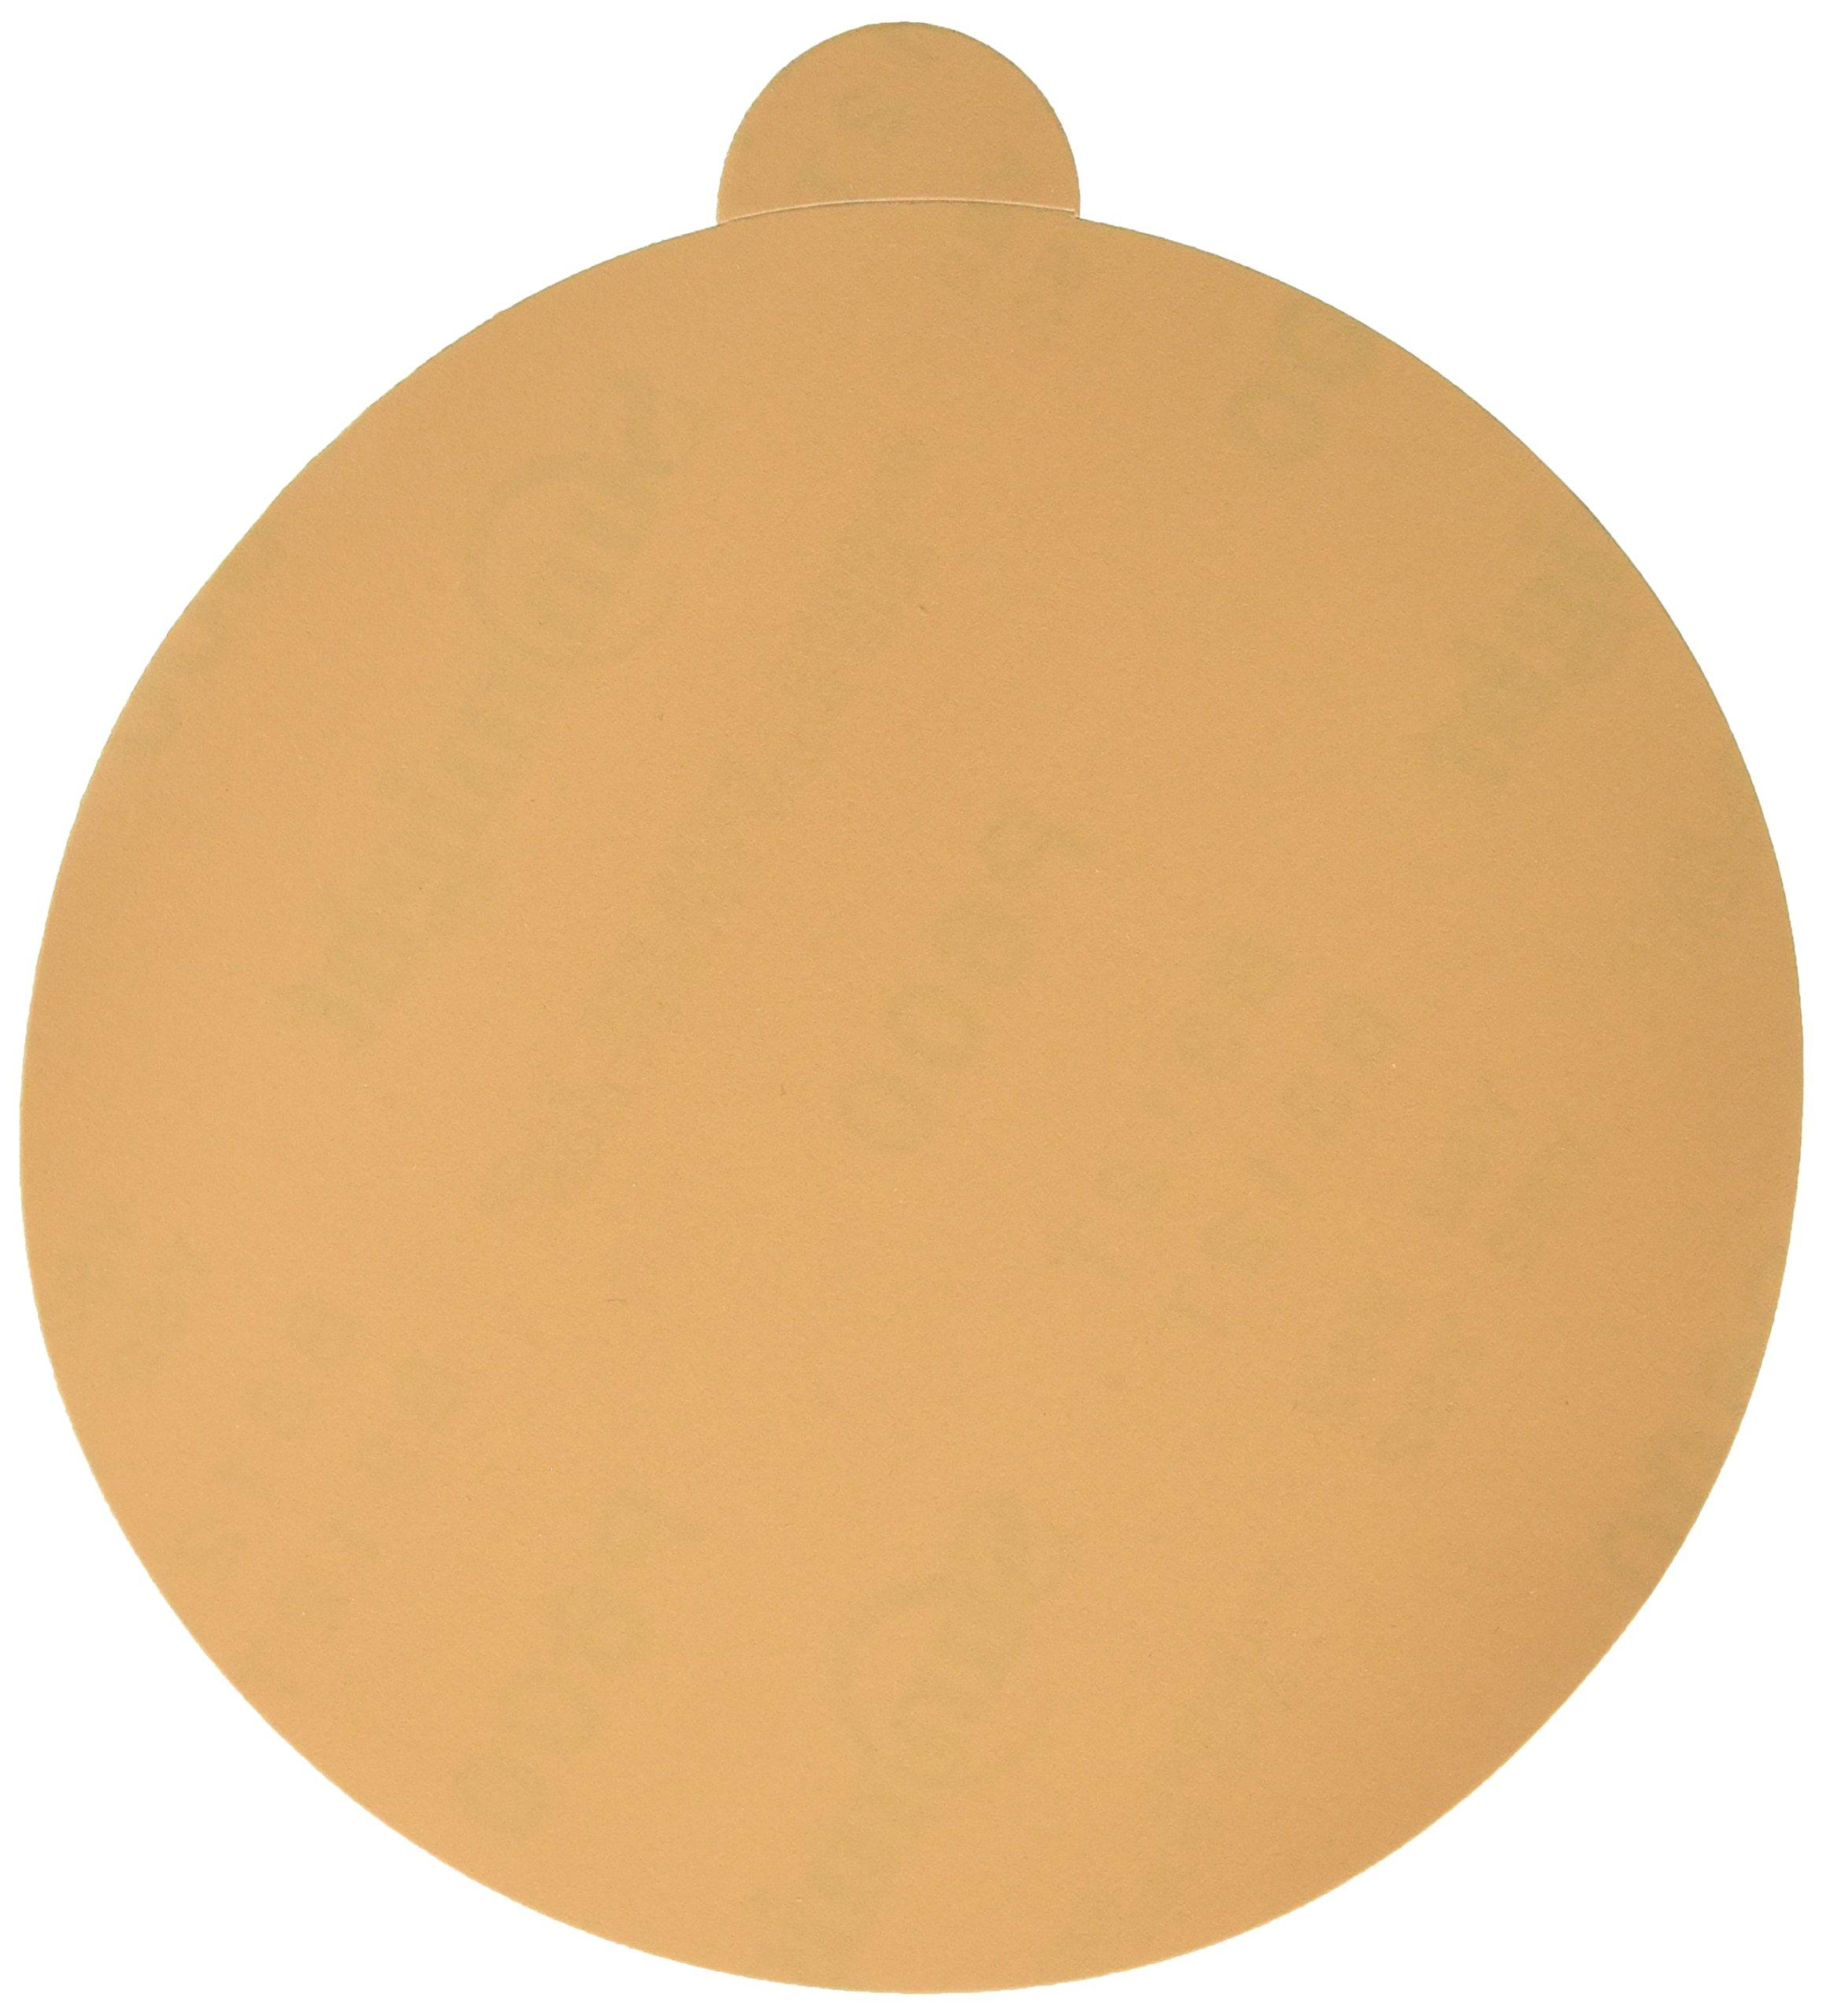 Sunmight 02318 6'' No Hole PSA Disc (Gold Grit 600)